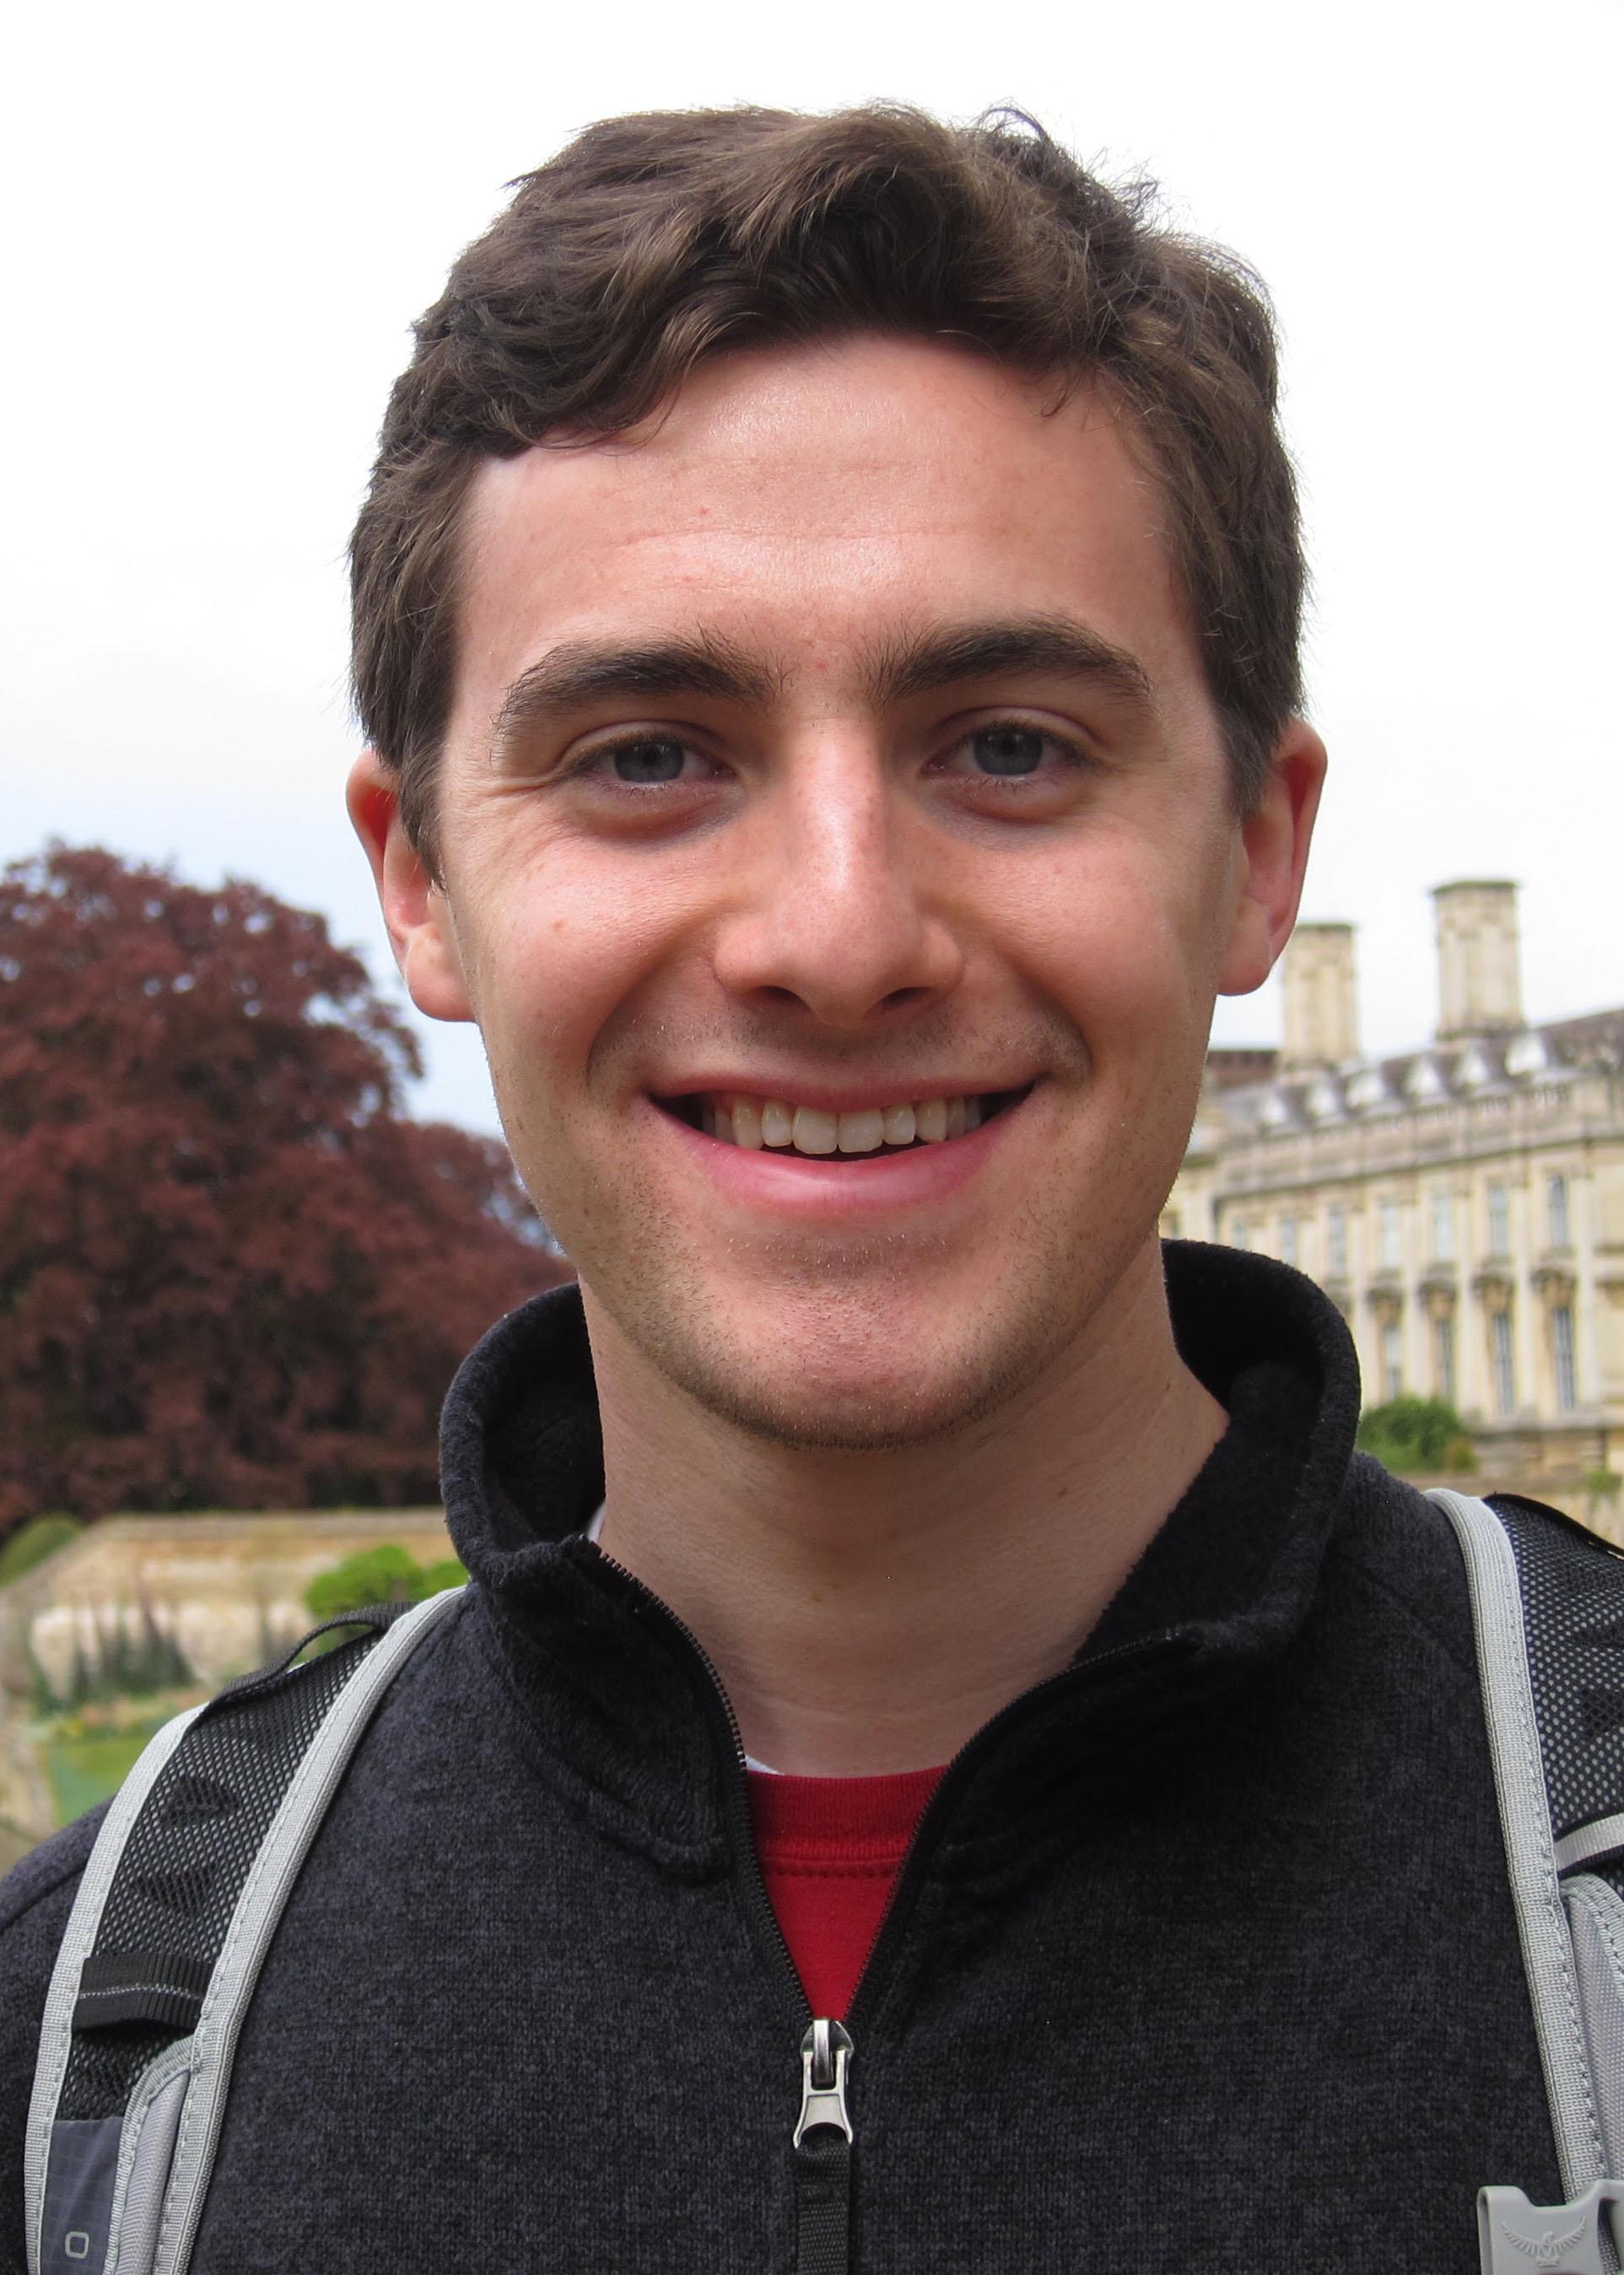 Peter C. Davidson - portrait headshot.JPG